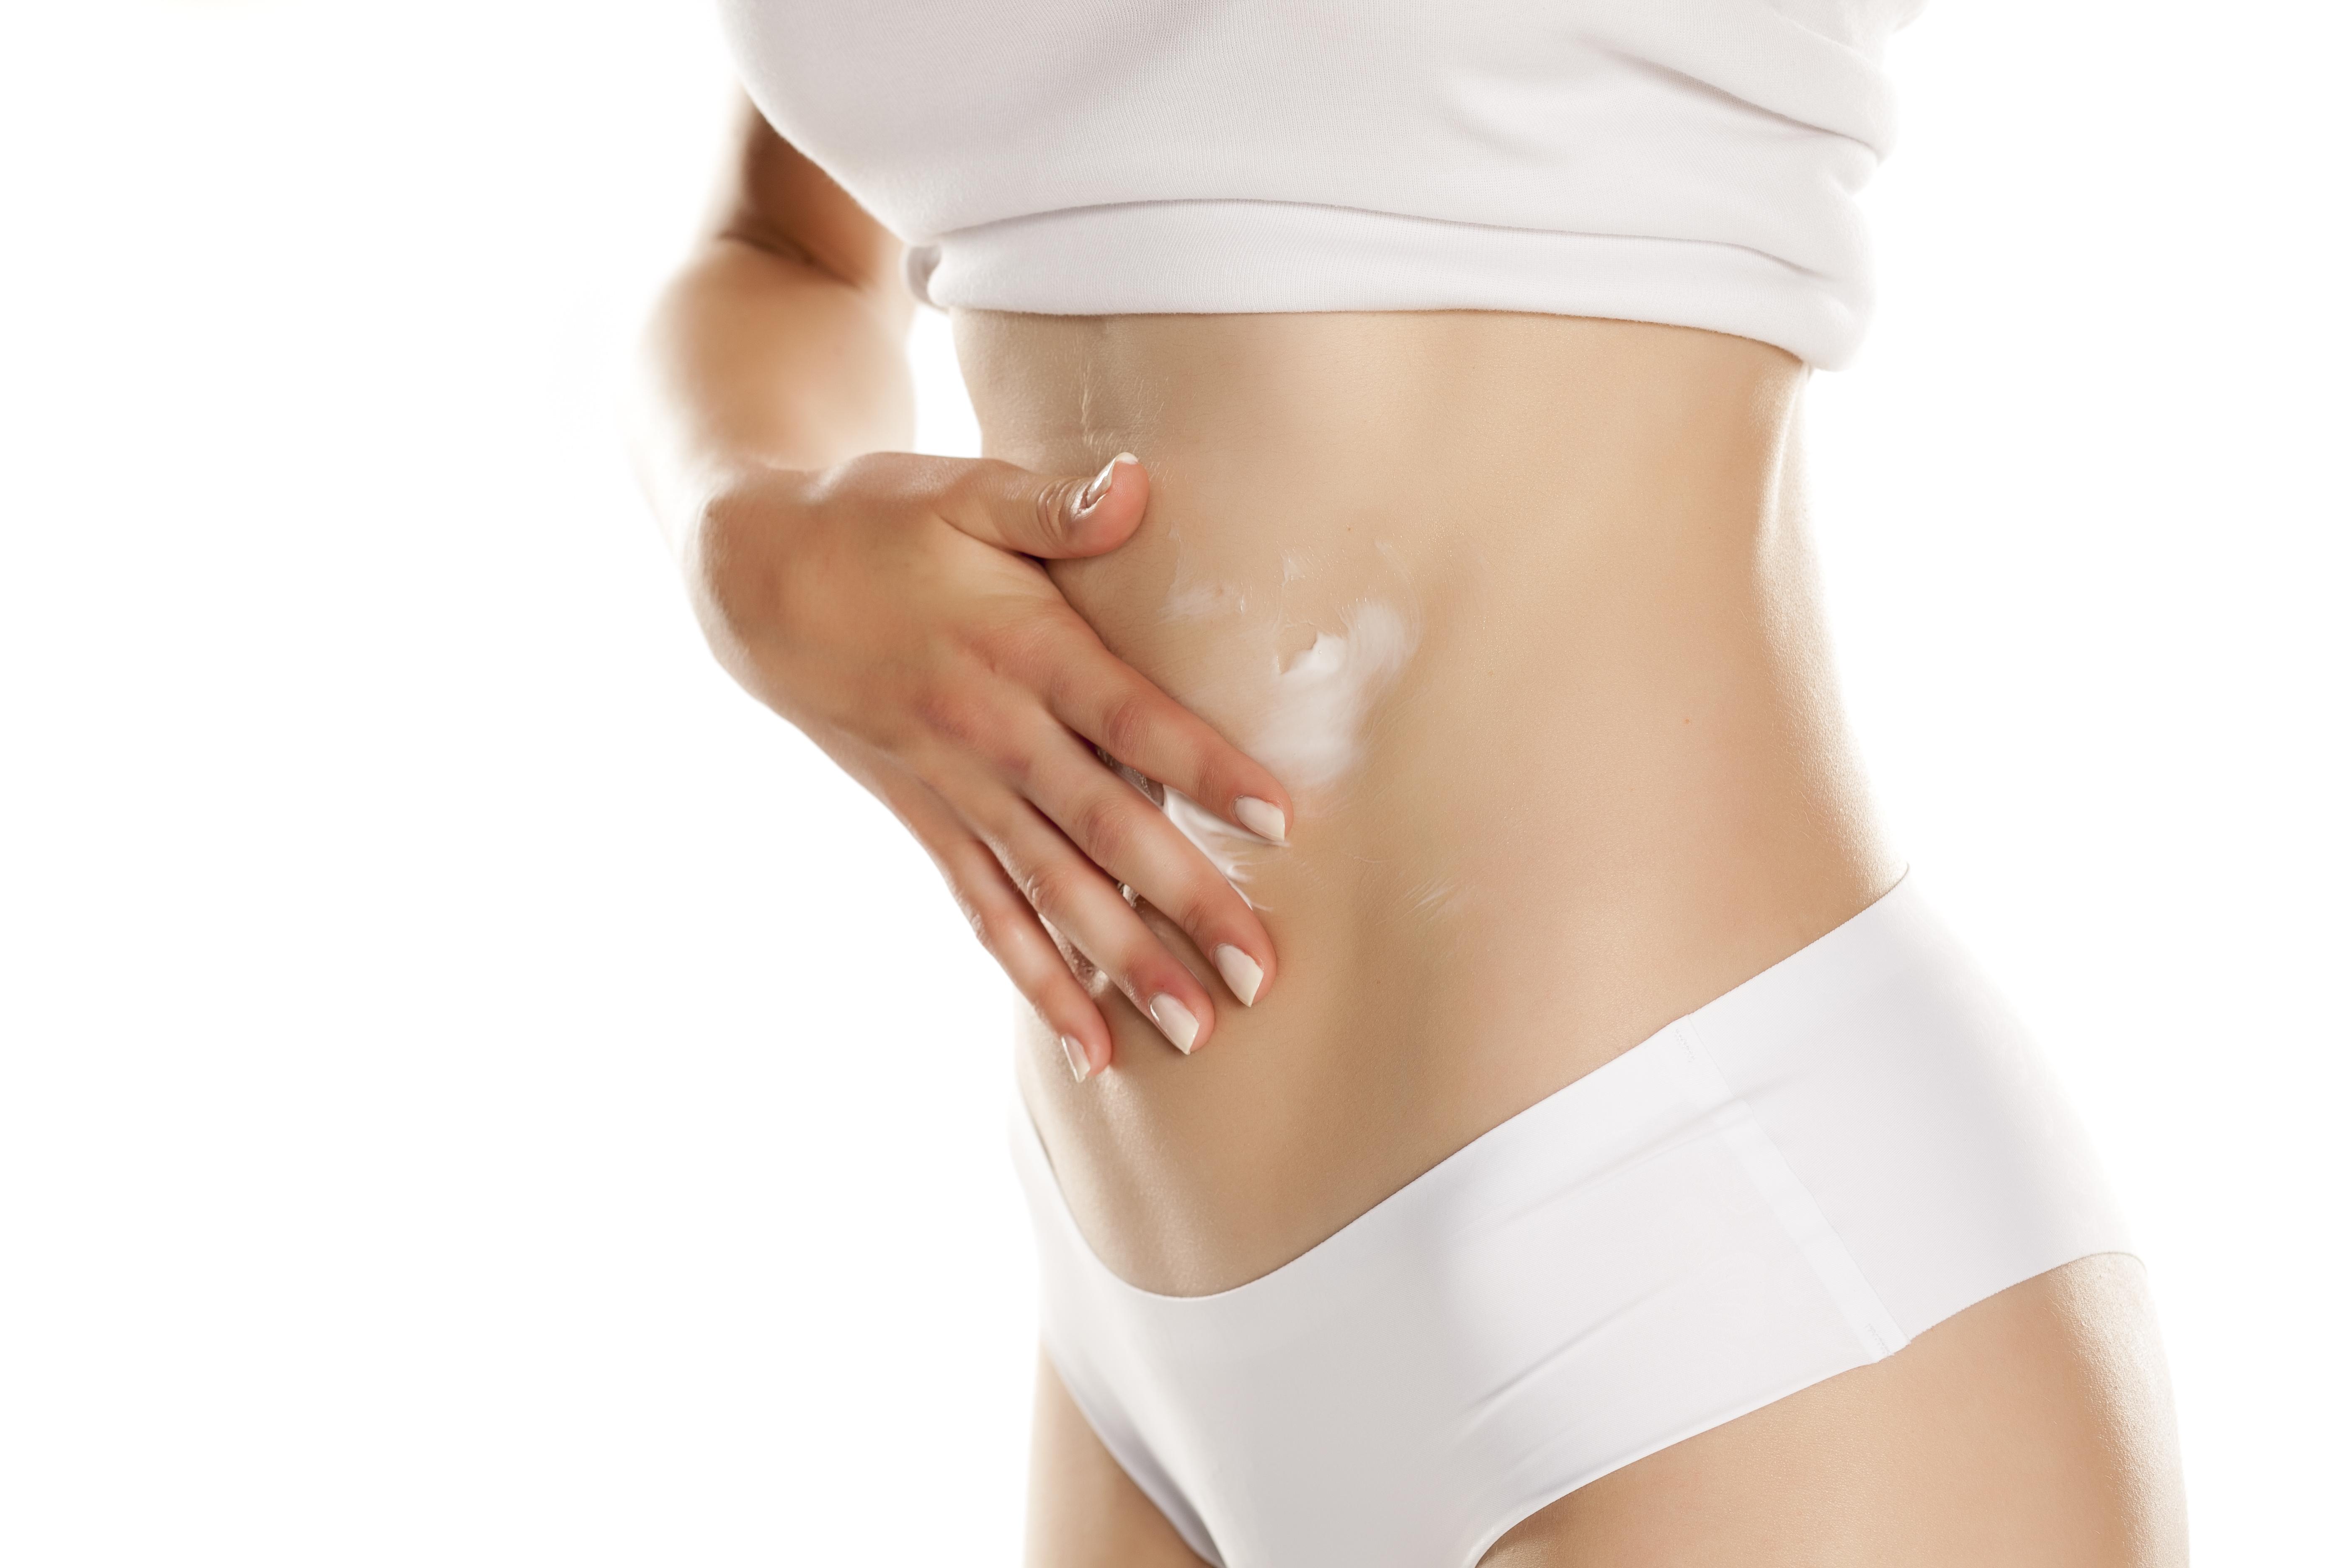 Aminophylline / Glycyrrhetinic Acid Fat Loss Cream